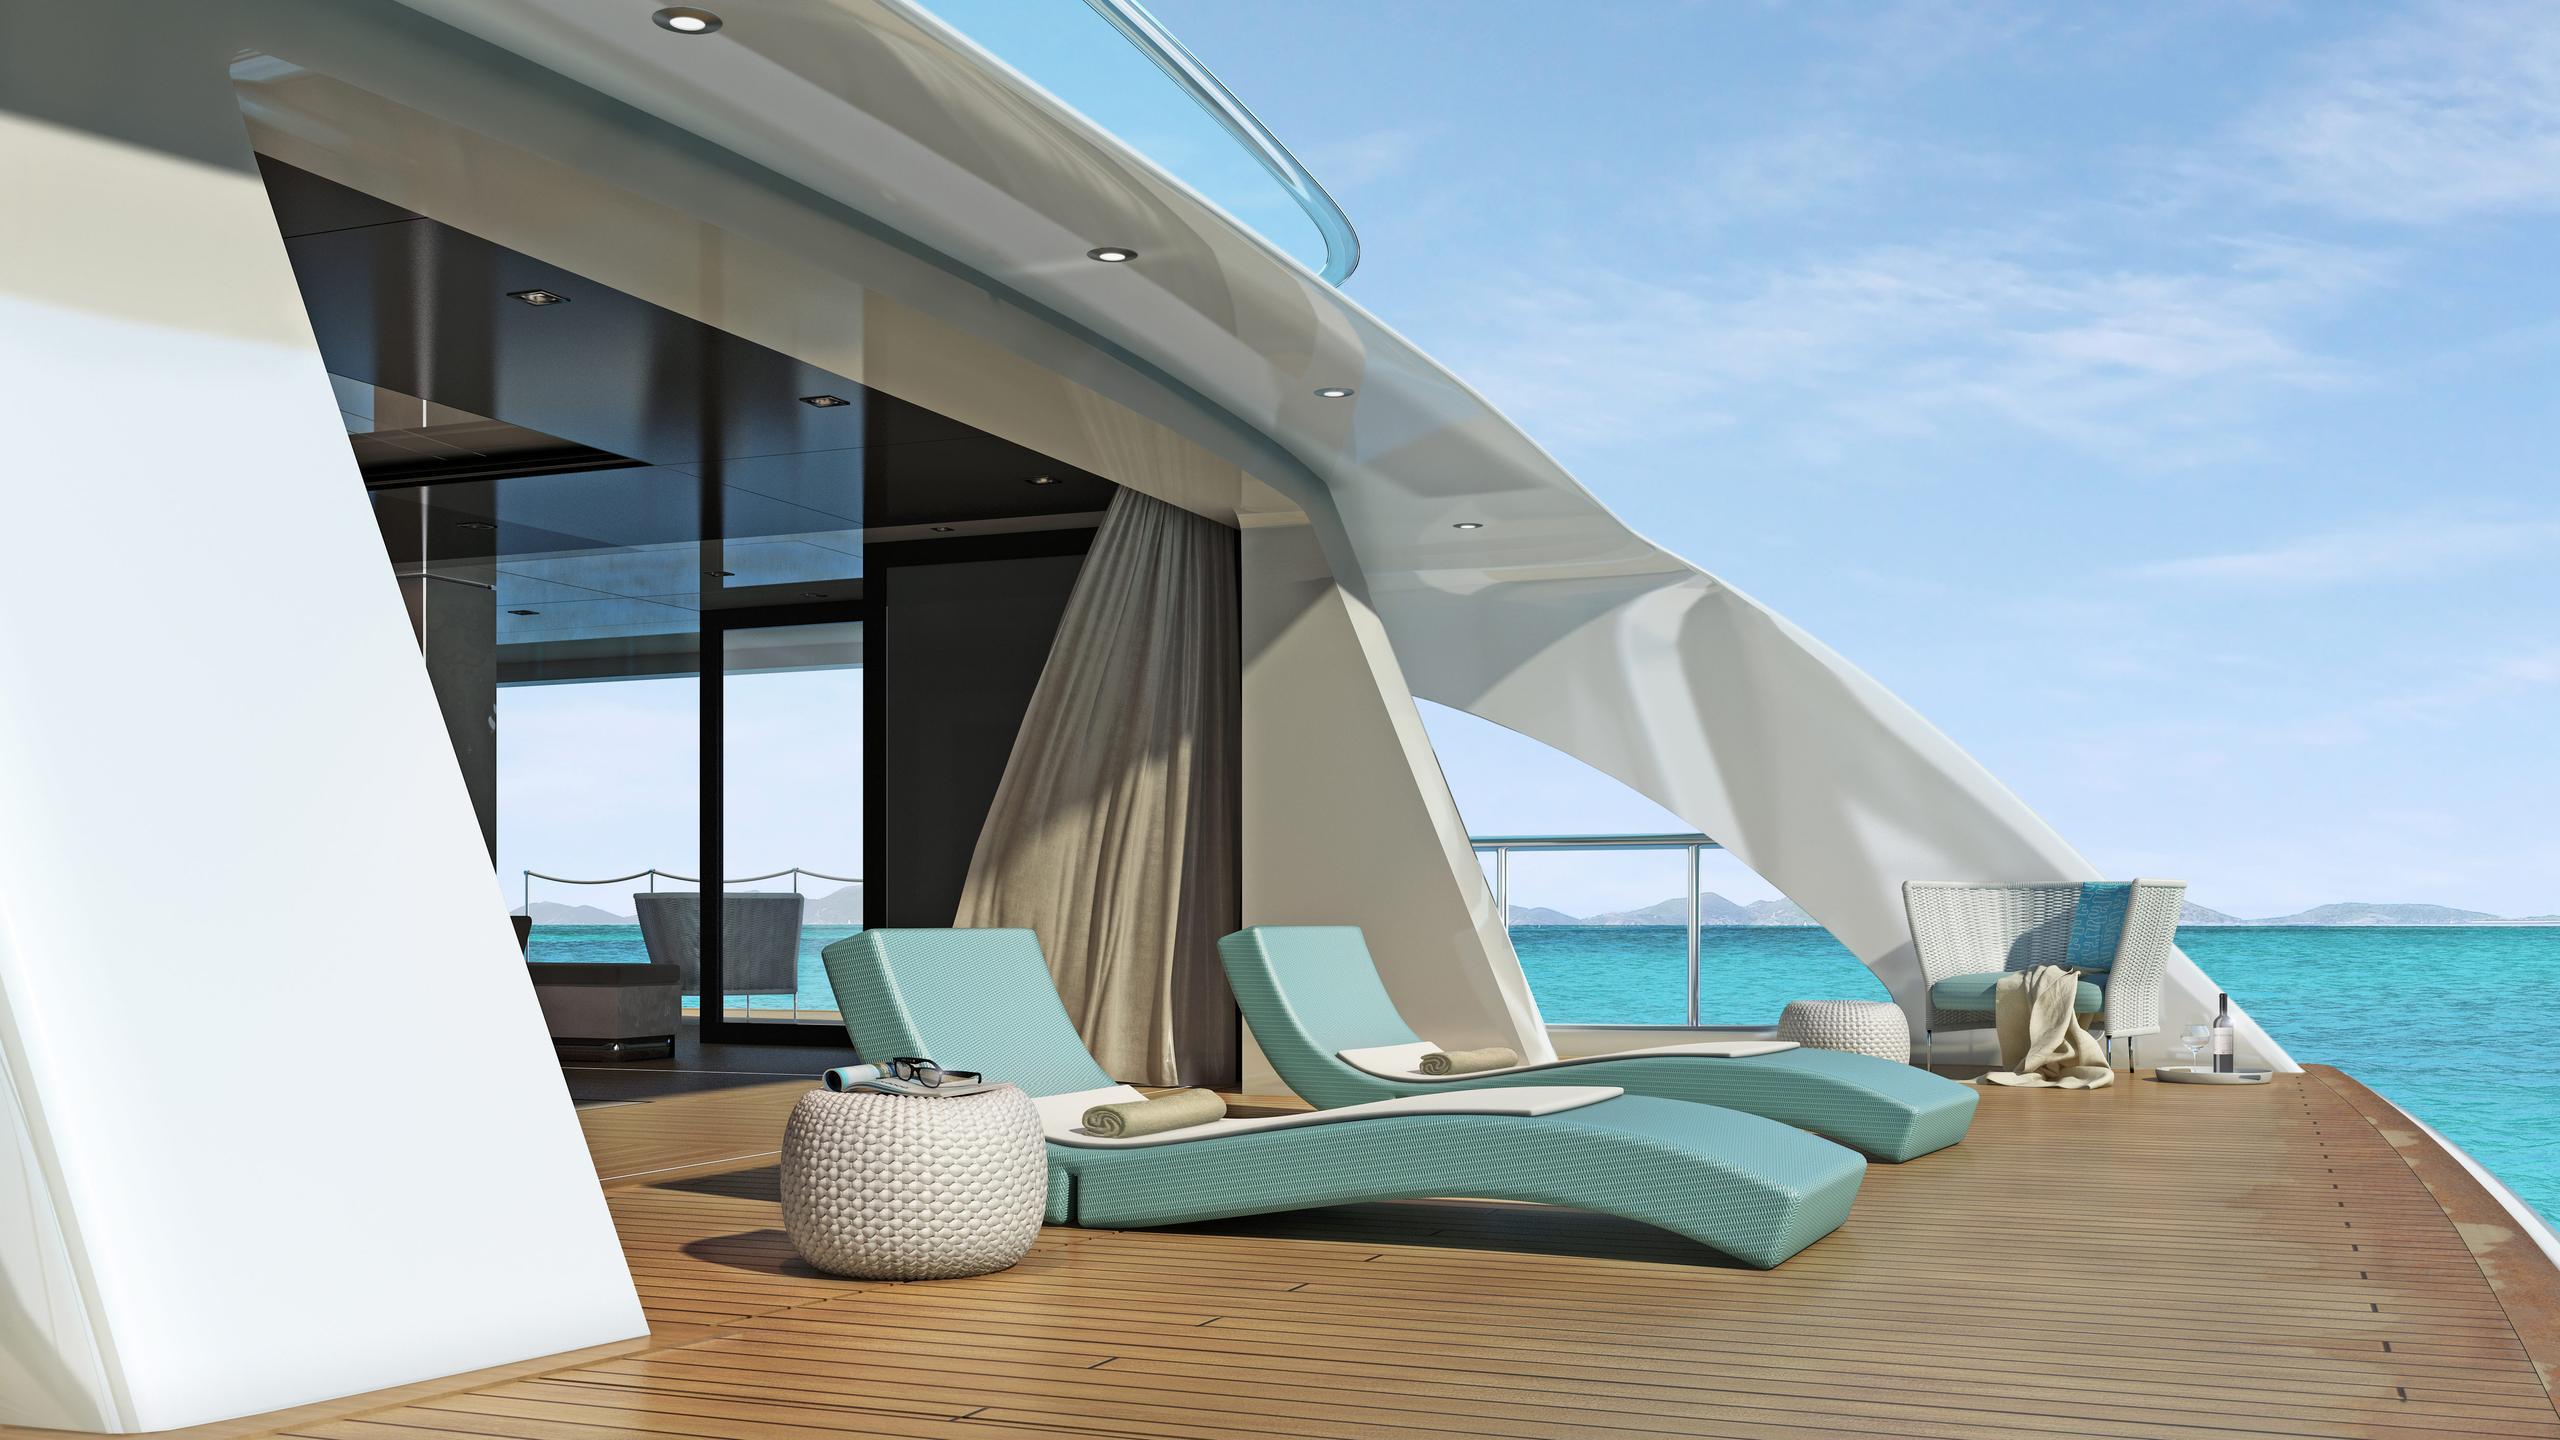 go motoryacht turquoise yachts nb63 77m 2018 rendering beachclub